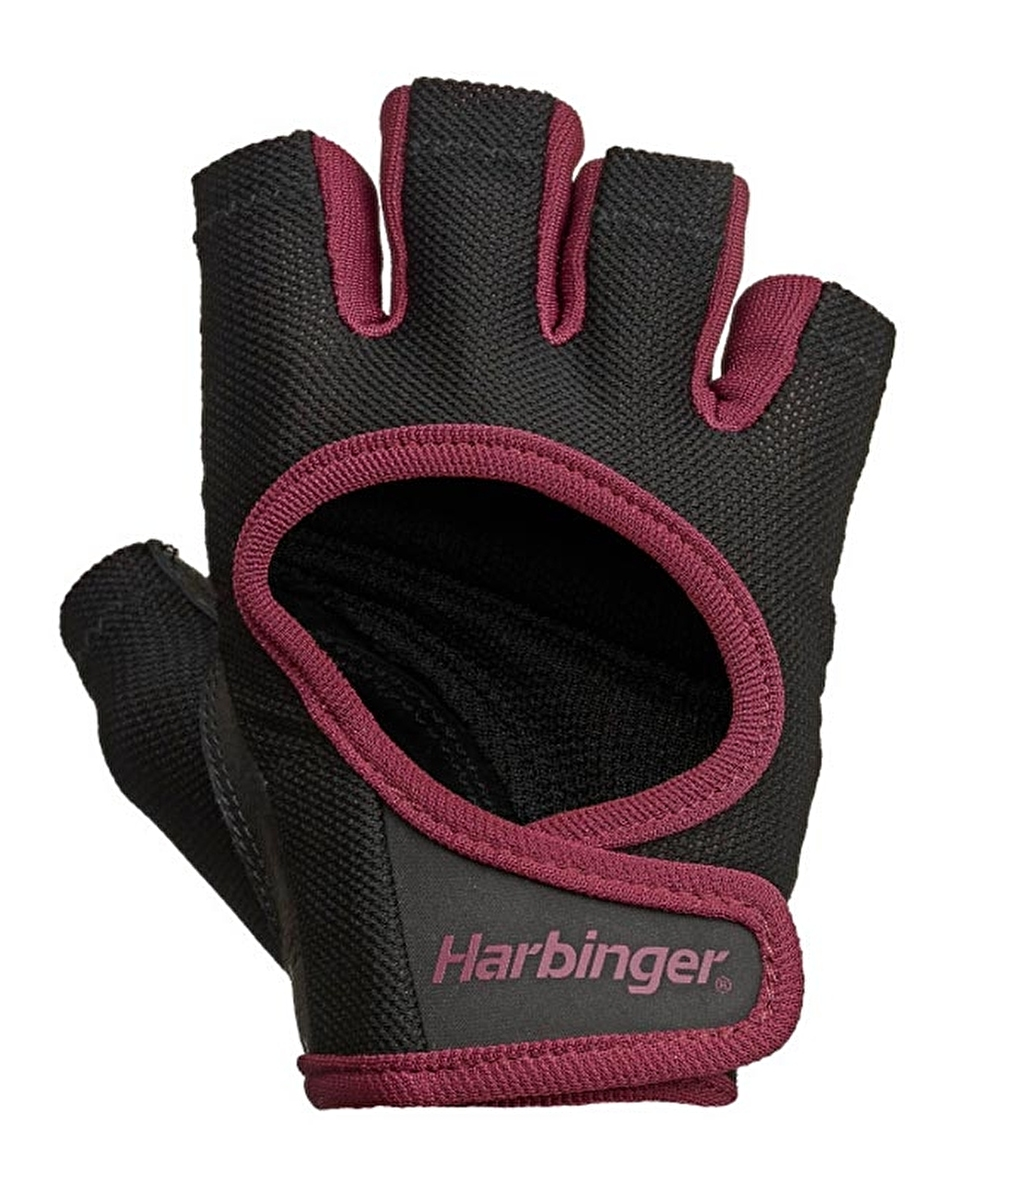 Harbinger Wmns Power Gloves Kadın Eldiven Siyah Bordo